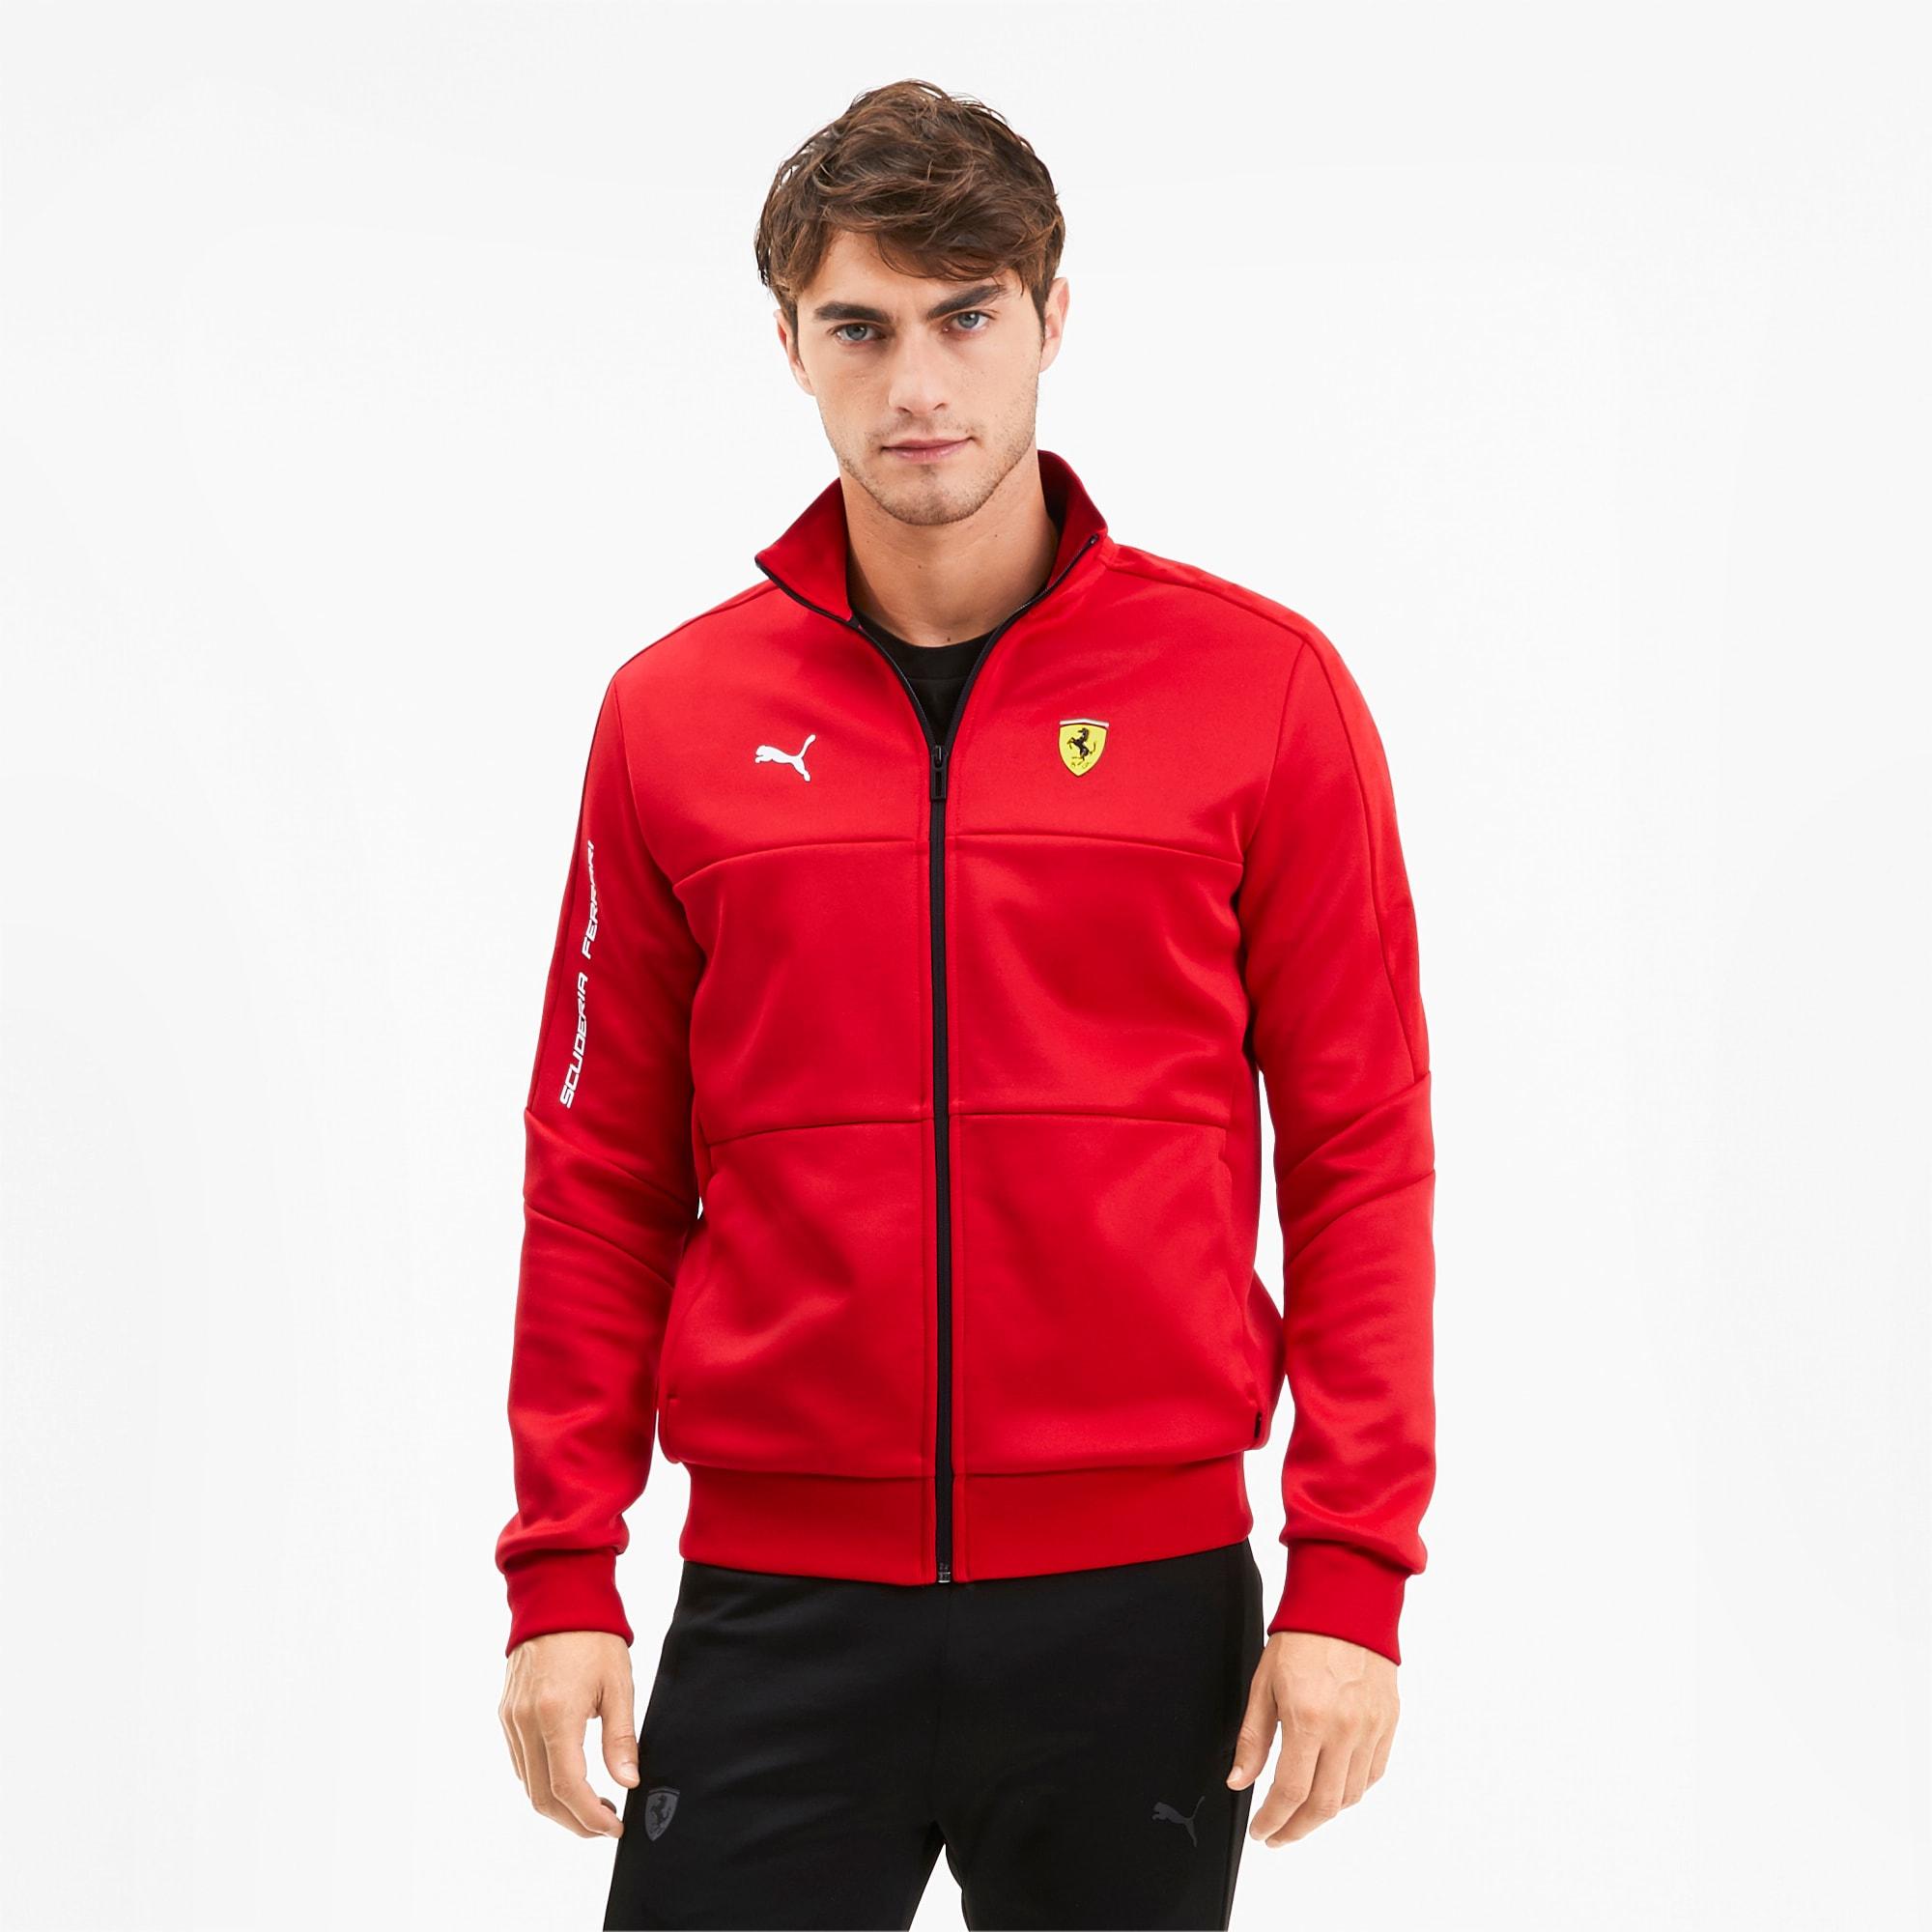 Puma Ferrari Edition Jackets Shop Clothing Shoes Online